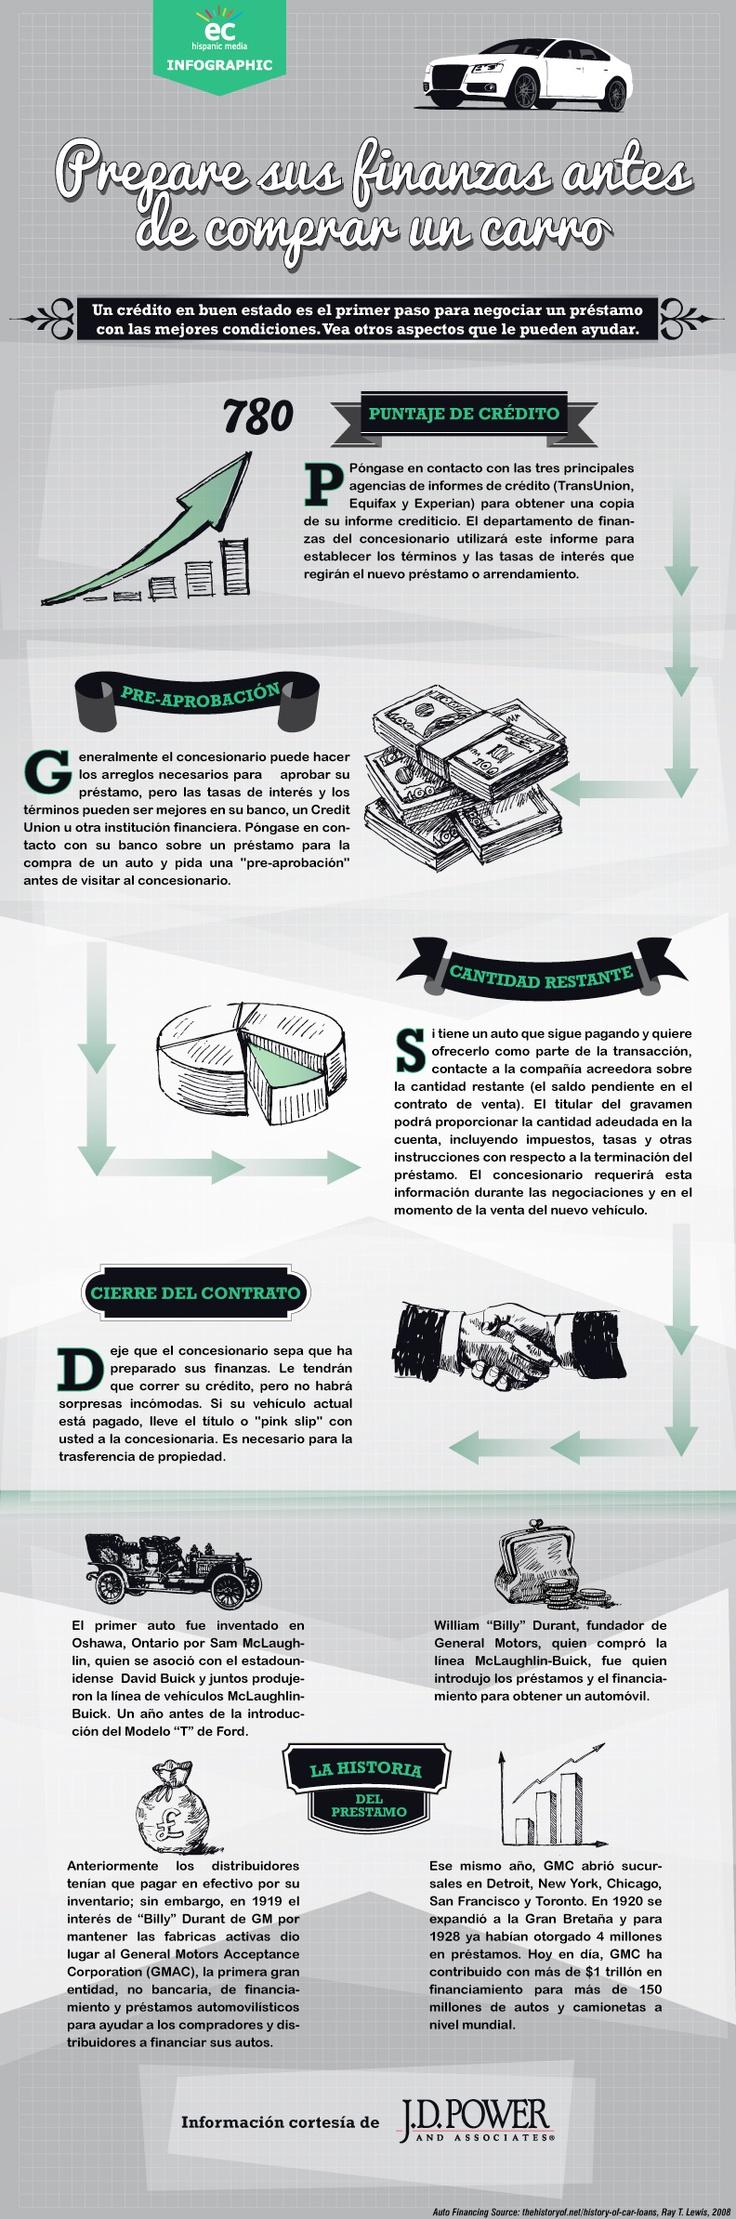 Prepare sus finanzas antes de comprar un carro. #infografia #infographic